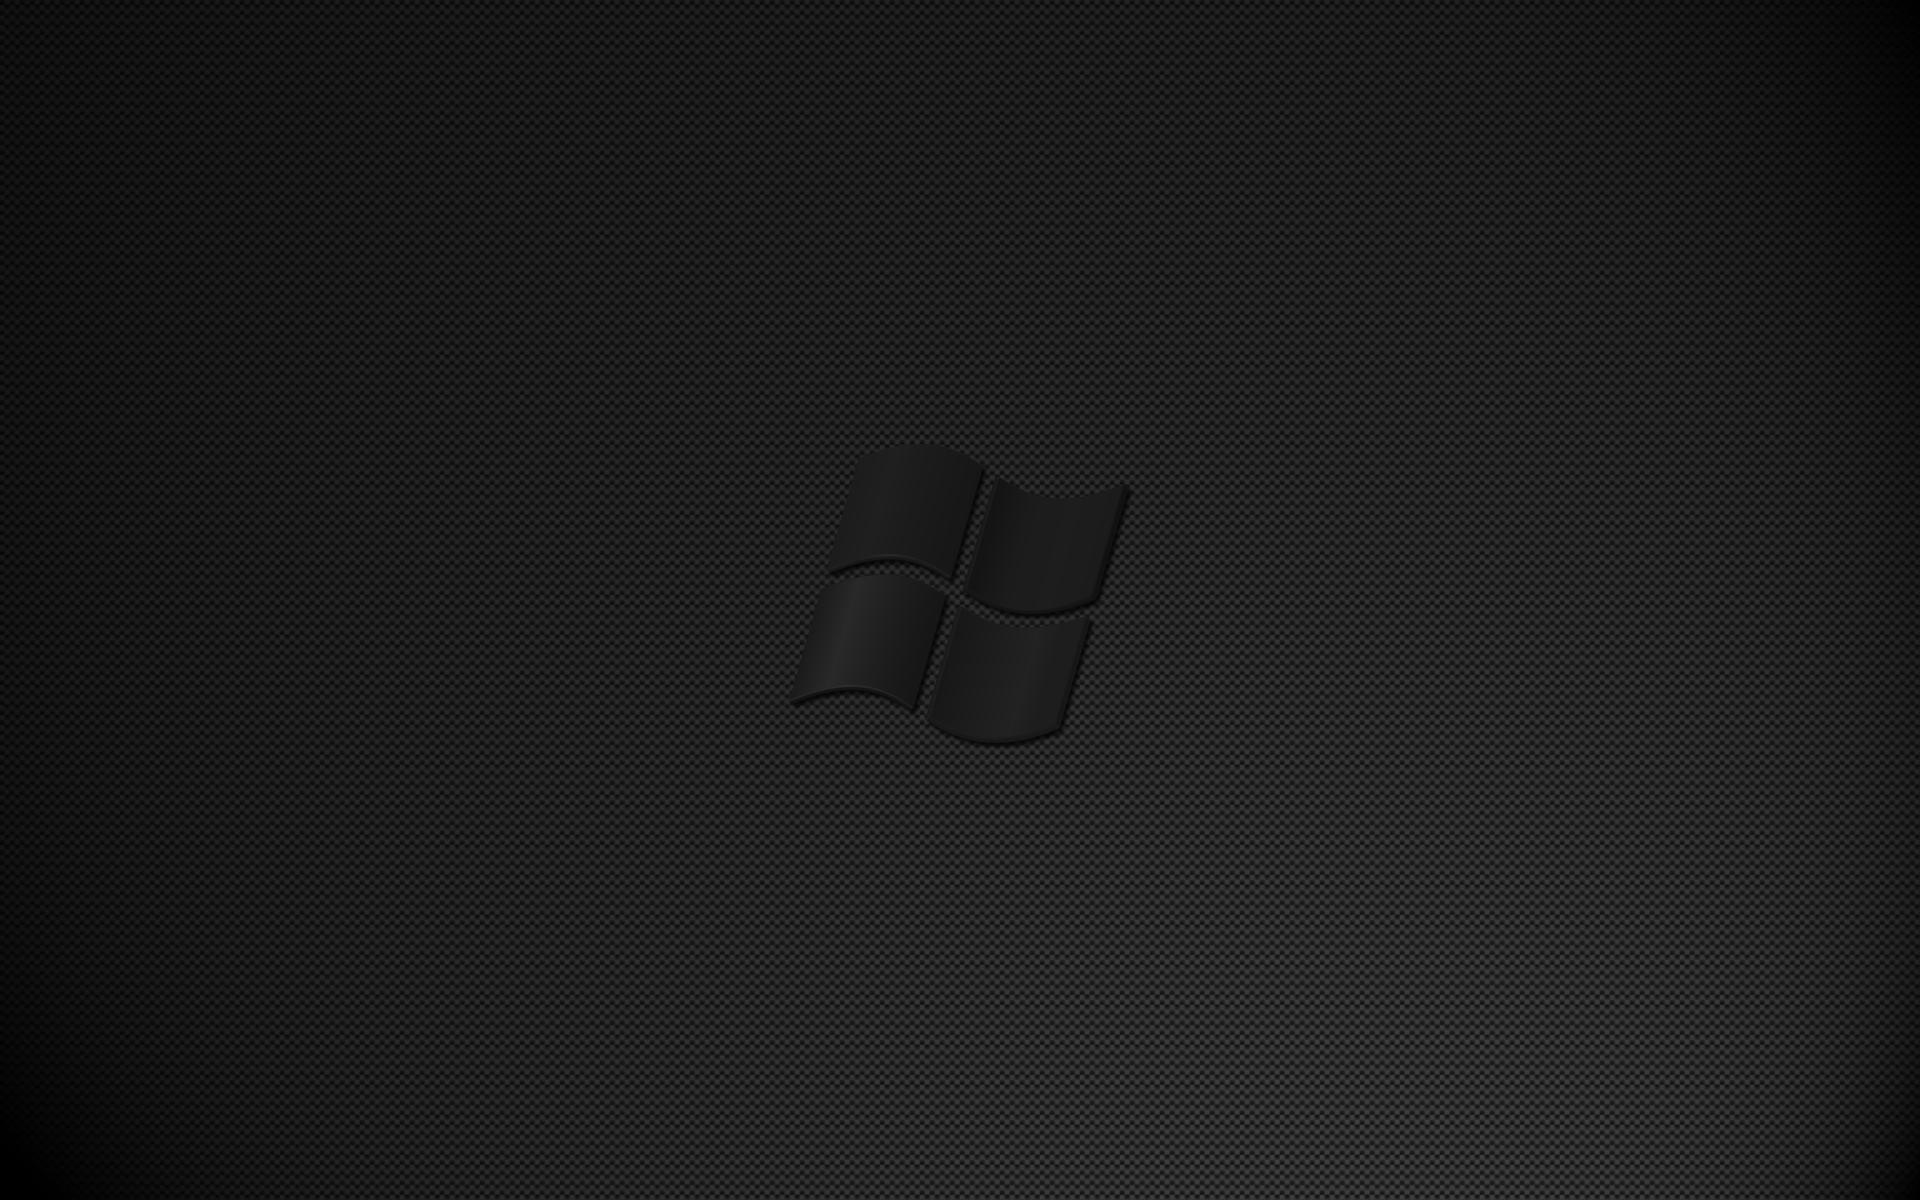 how to delete desktop background in windows 10